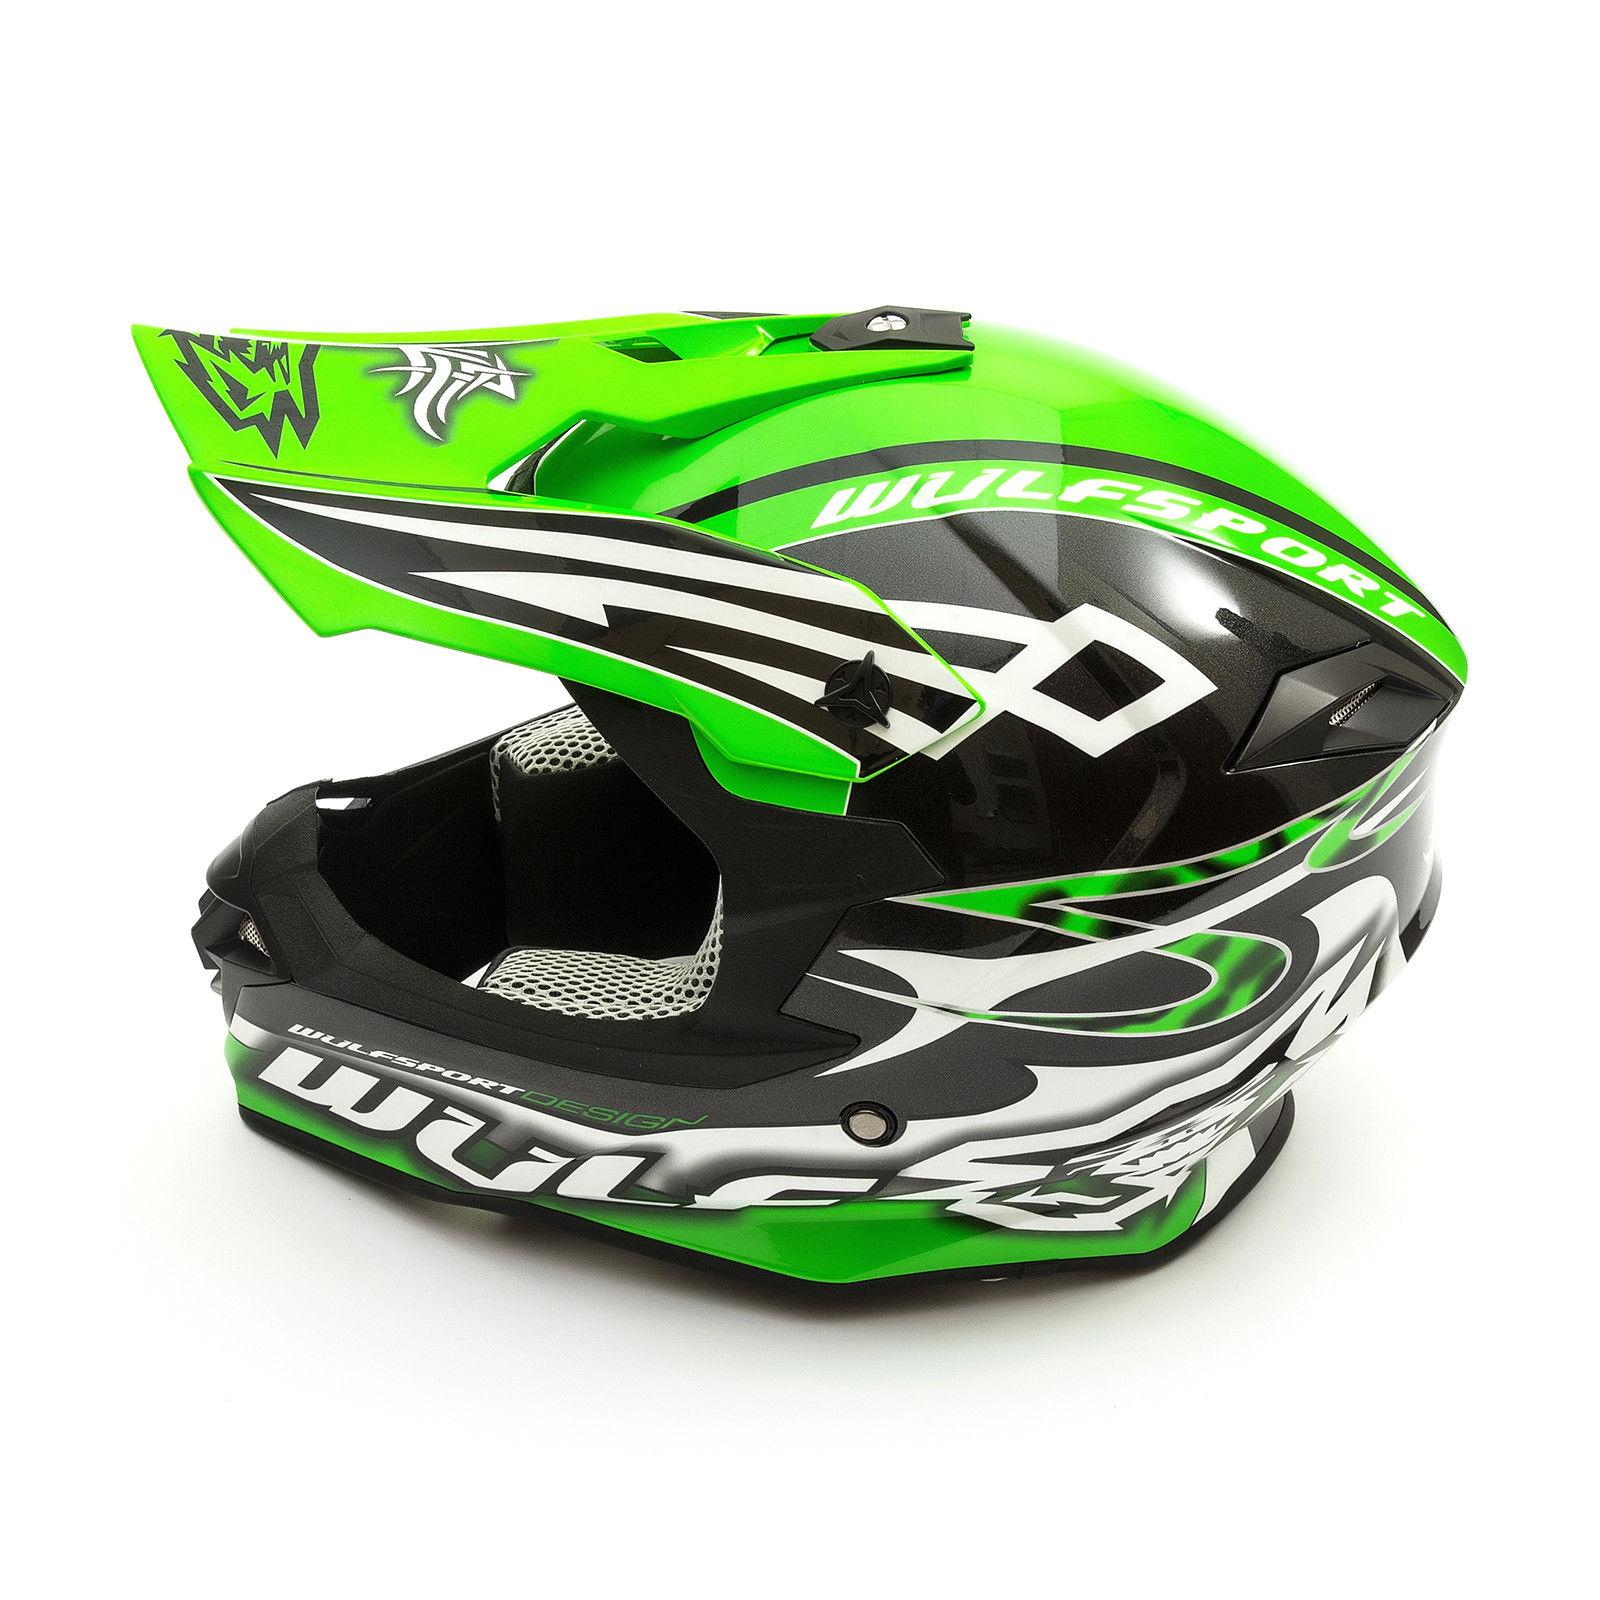 Wulfsport-Adult-Sceptre-Helmets-Motocross-Pitbike-Motorbike-Off-Road-Racing-ATV thumbnail 64